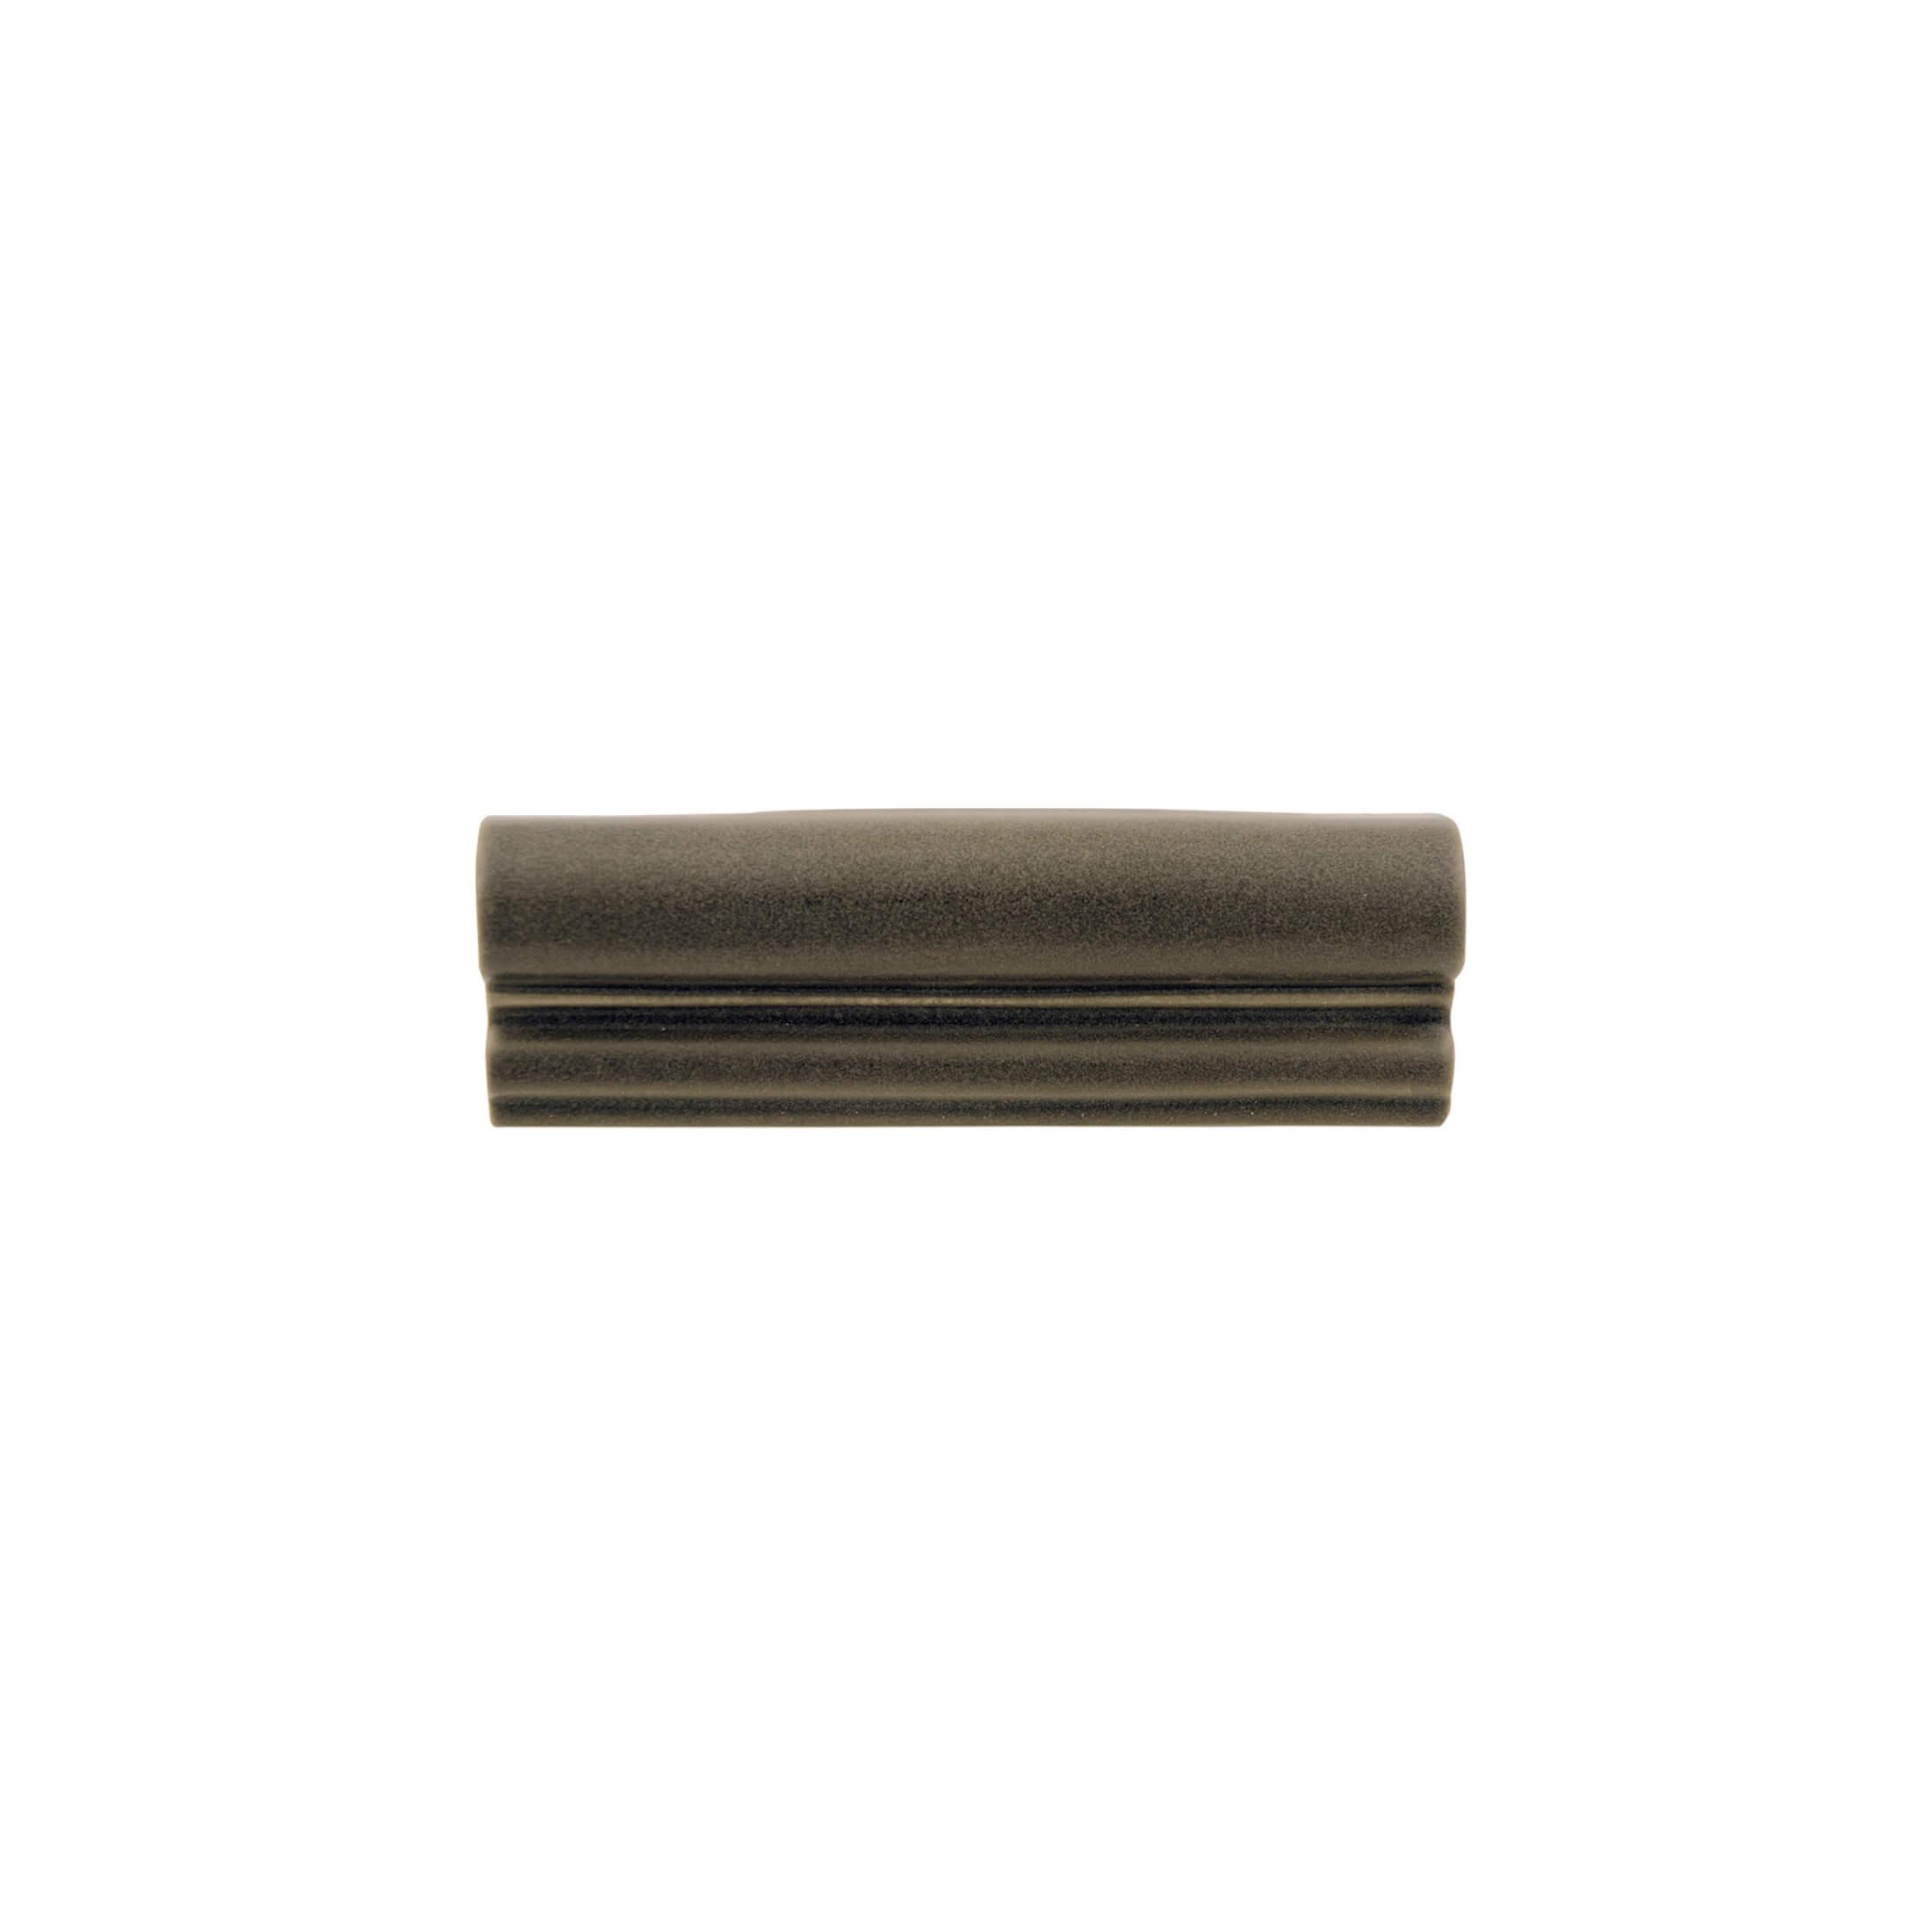 ADNT5001 - MOLDURA  - 5 cm X 15 cm